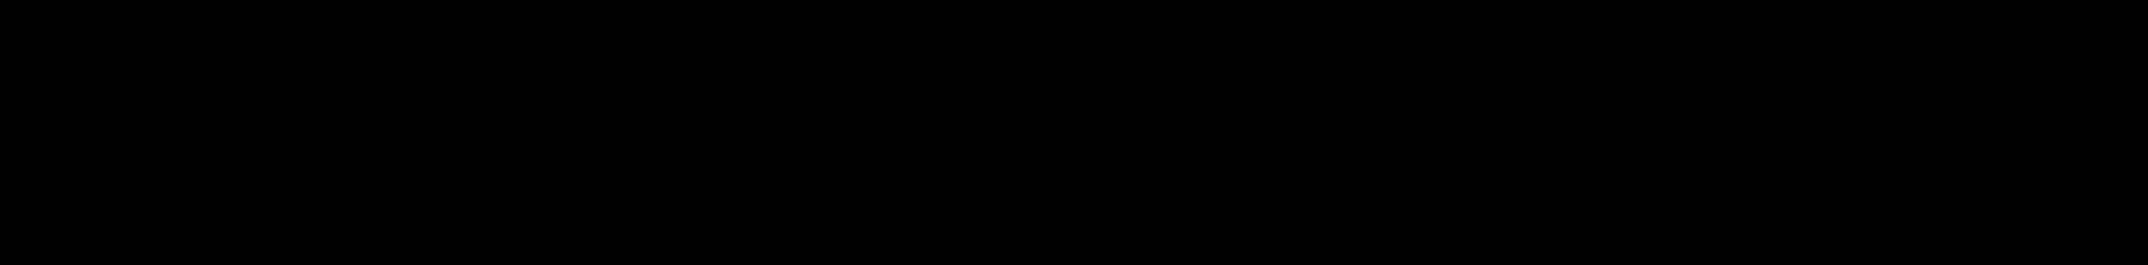 Shapely Font by Scholtz Fonts : Font Bros.